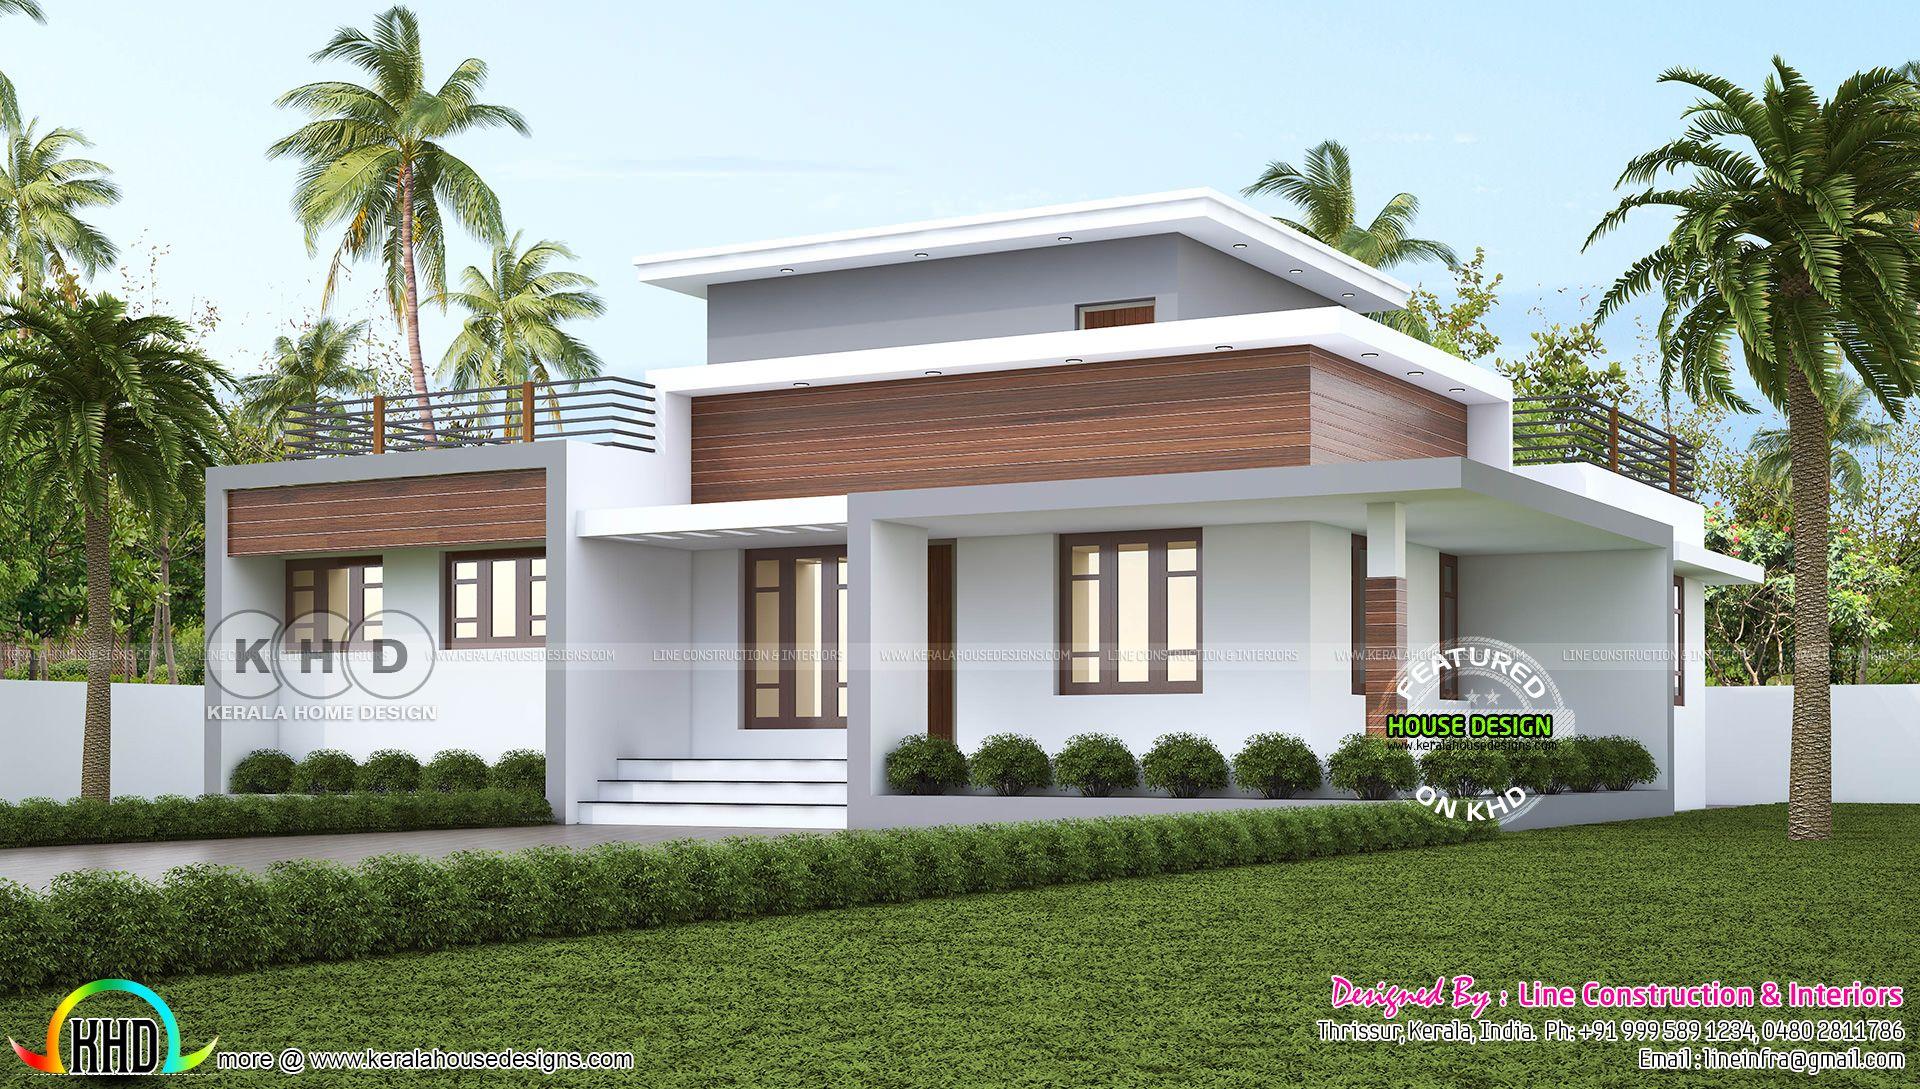 1300 square feet 3 bedroom flat roof house plan single